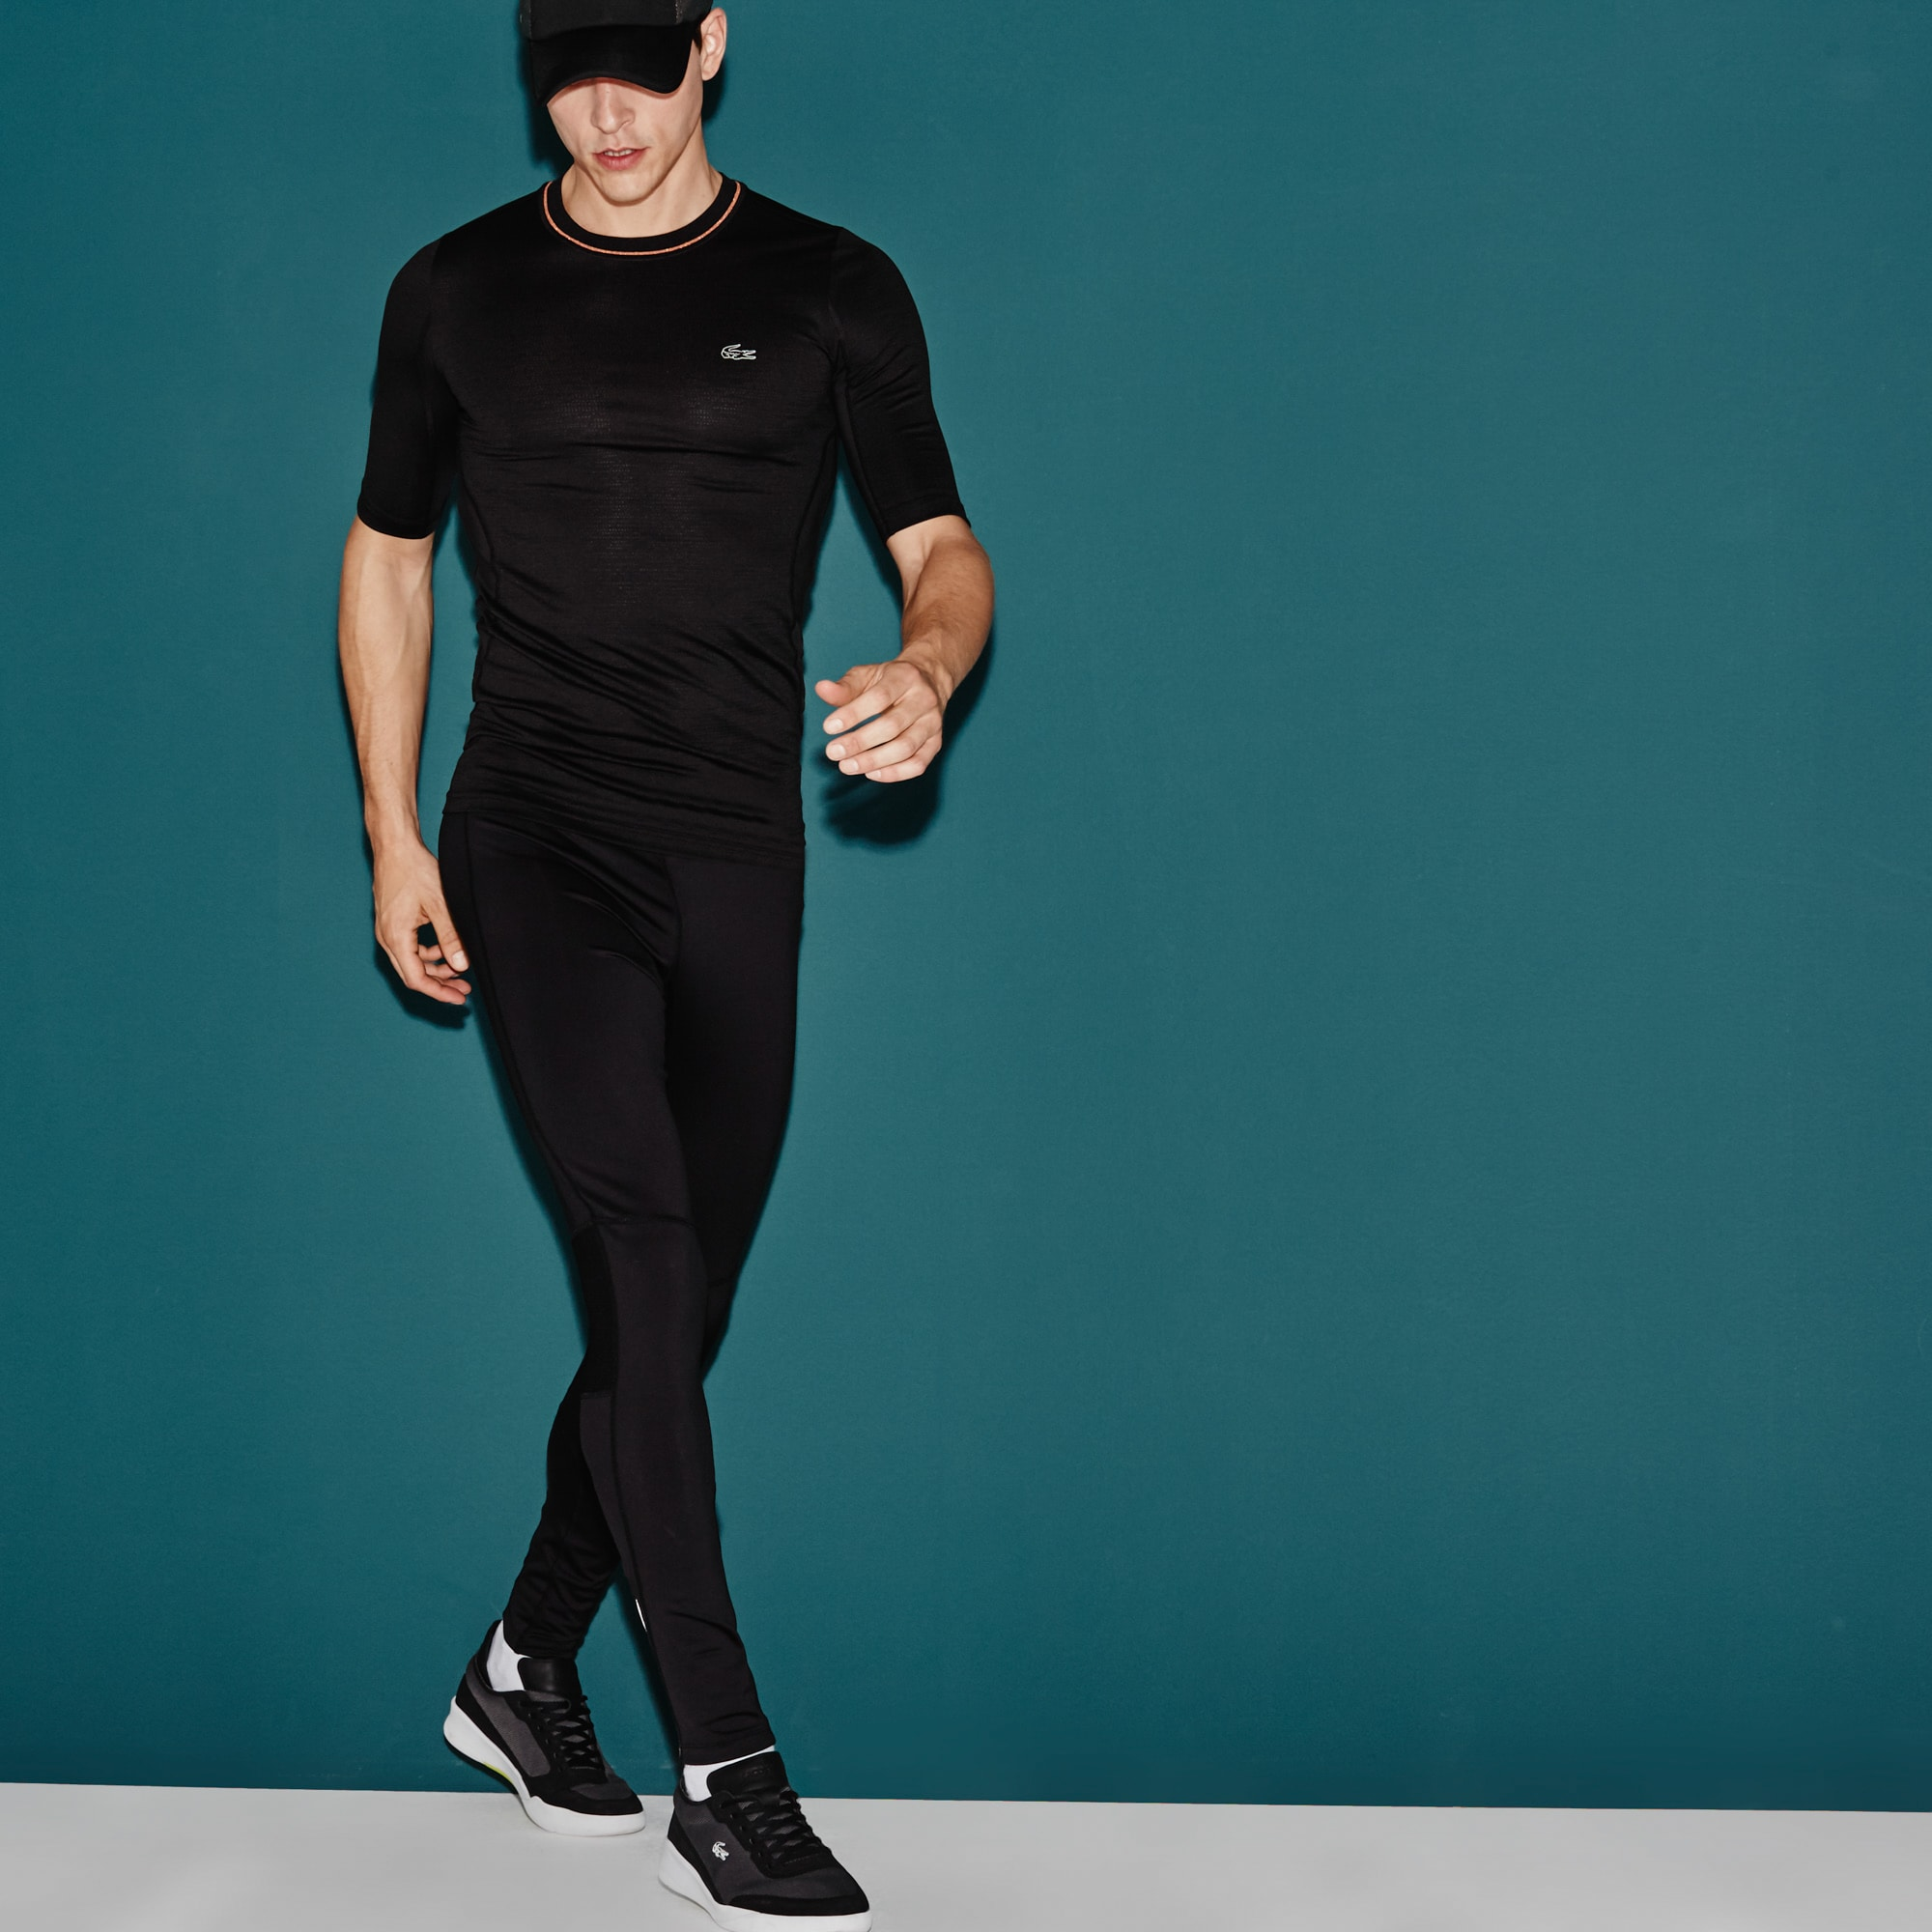 Men's SPORT Tennis Stretch Leggings